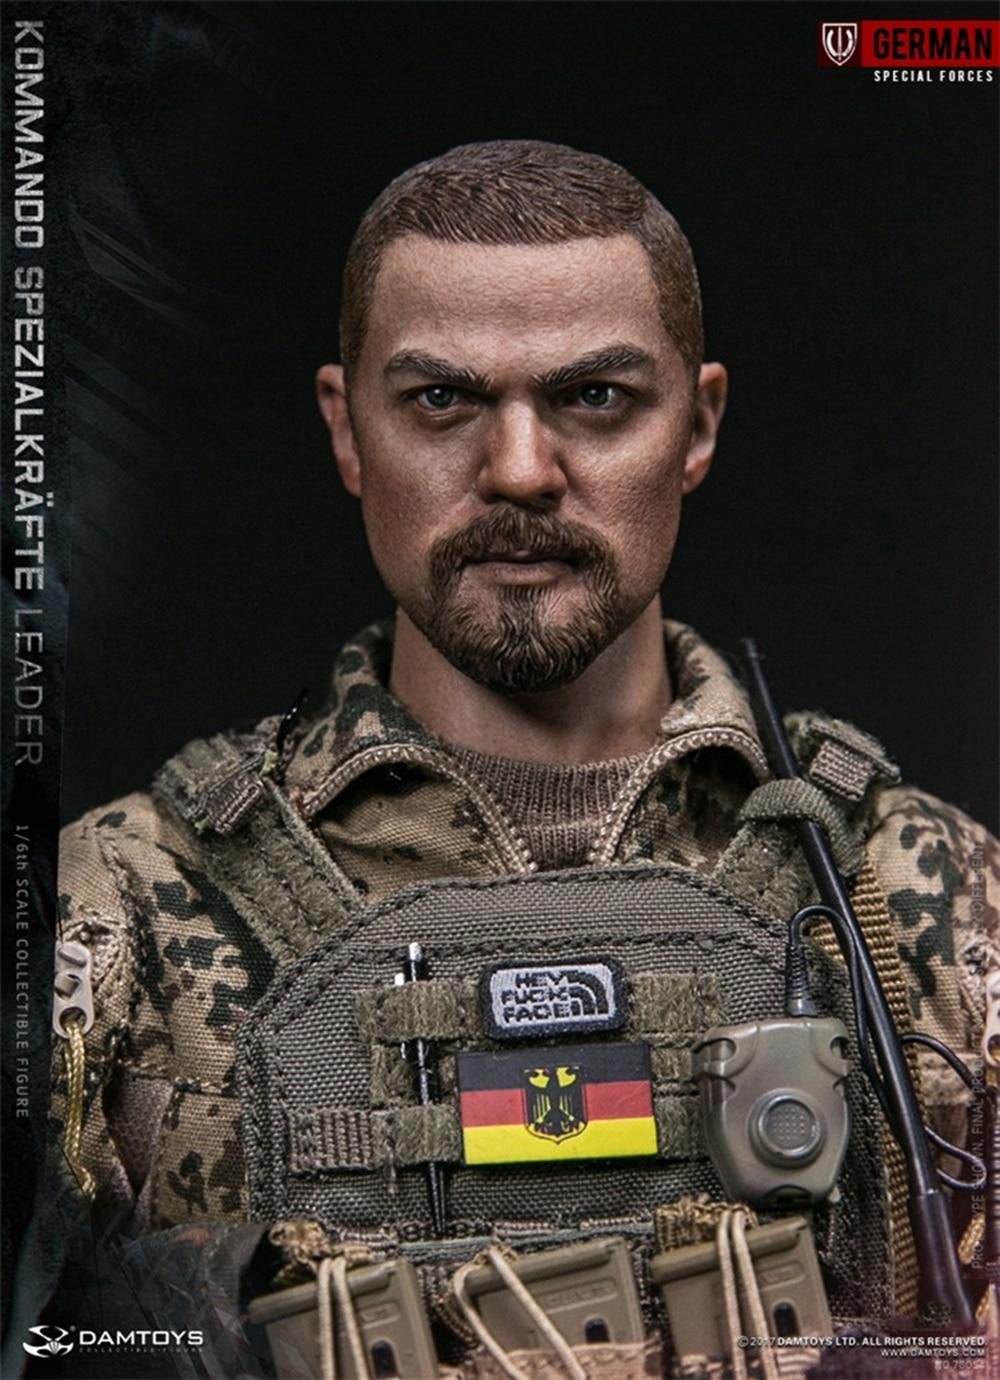 1//6 KSK Kommando Spezialkräfte leader ALLEMAND action figure 78054 DAMTOYS